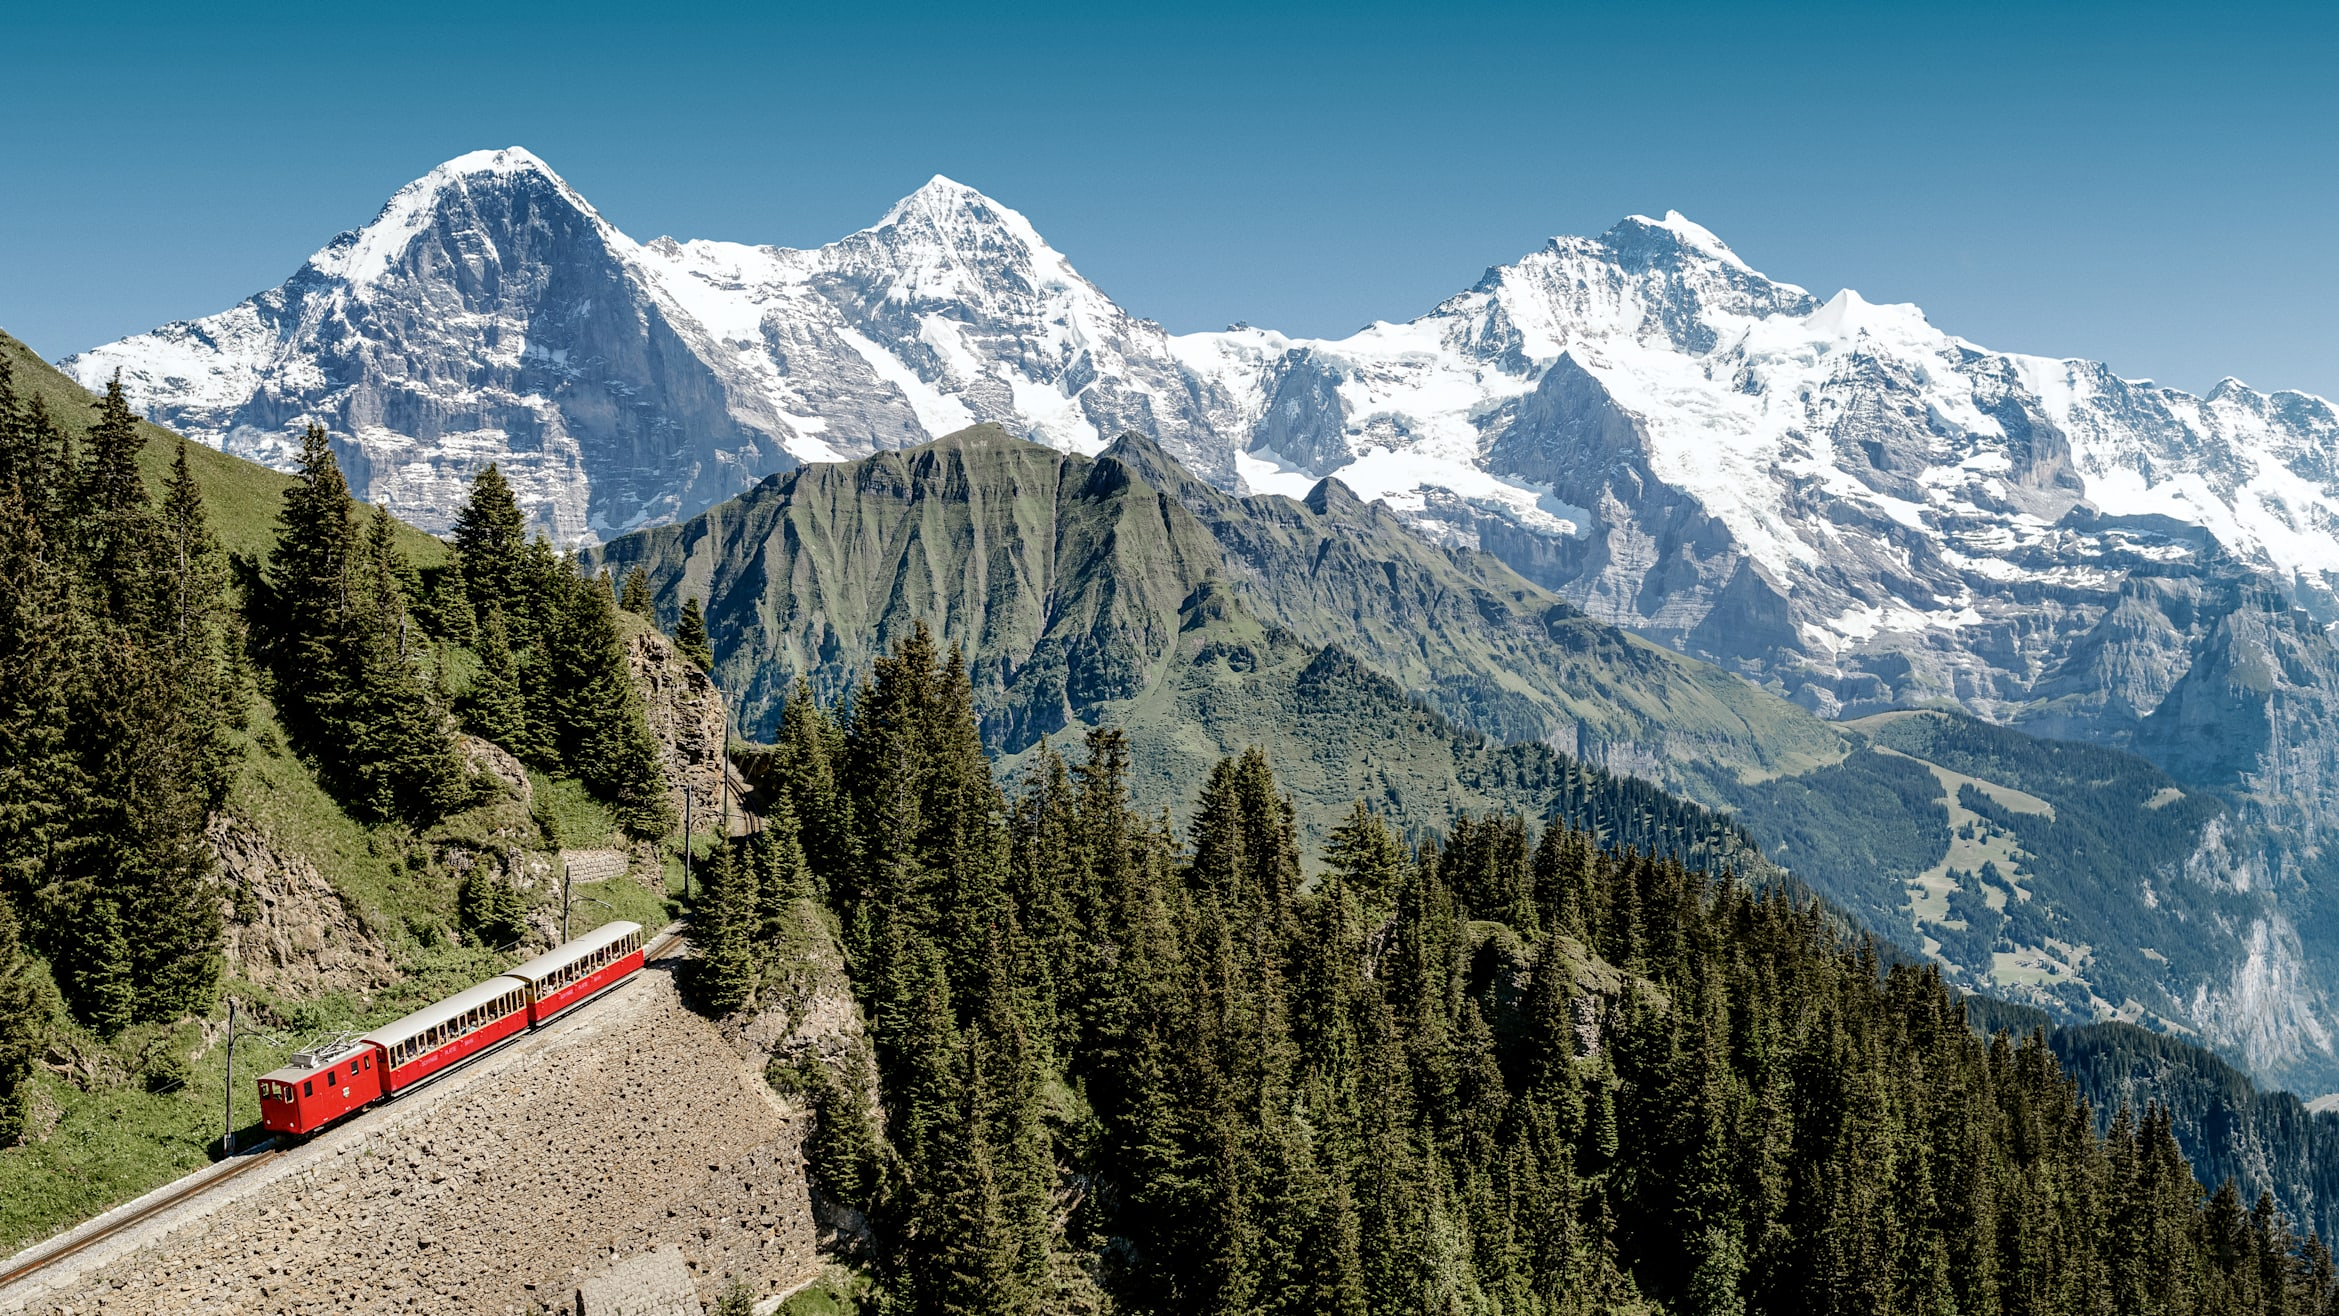 Railway machines, season, Schynige-Platte, Schynige-Platte-Railway, summer, jungfrau.ch